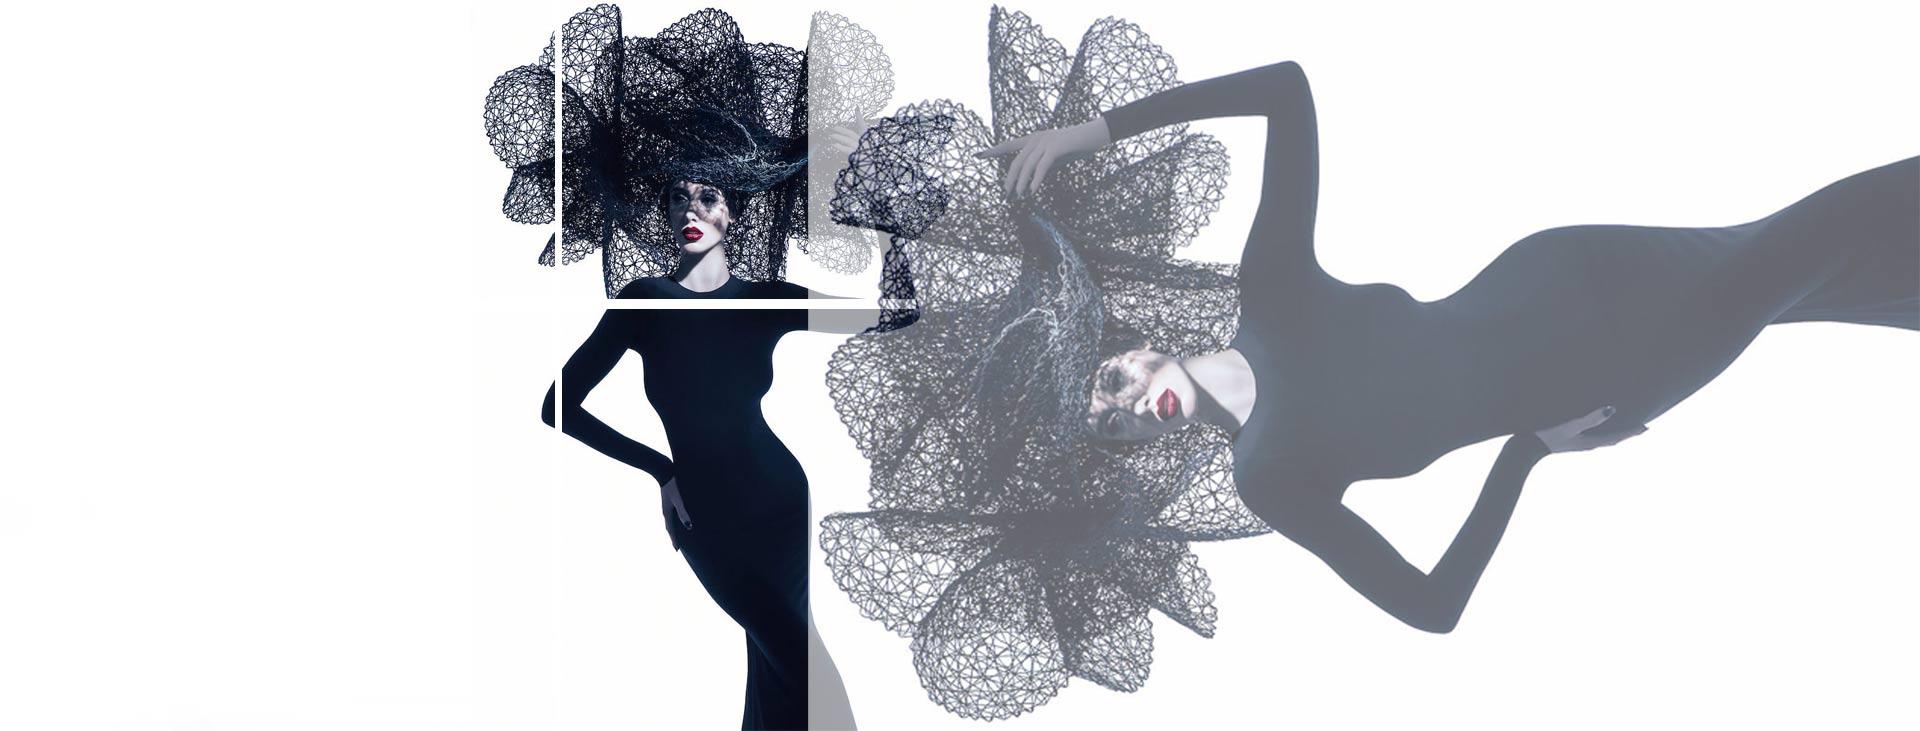 avant garde  women 10 - استایل آوانگارد زنانه